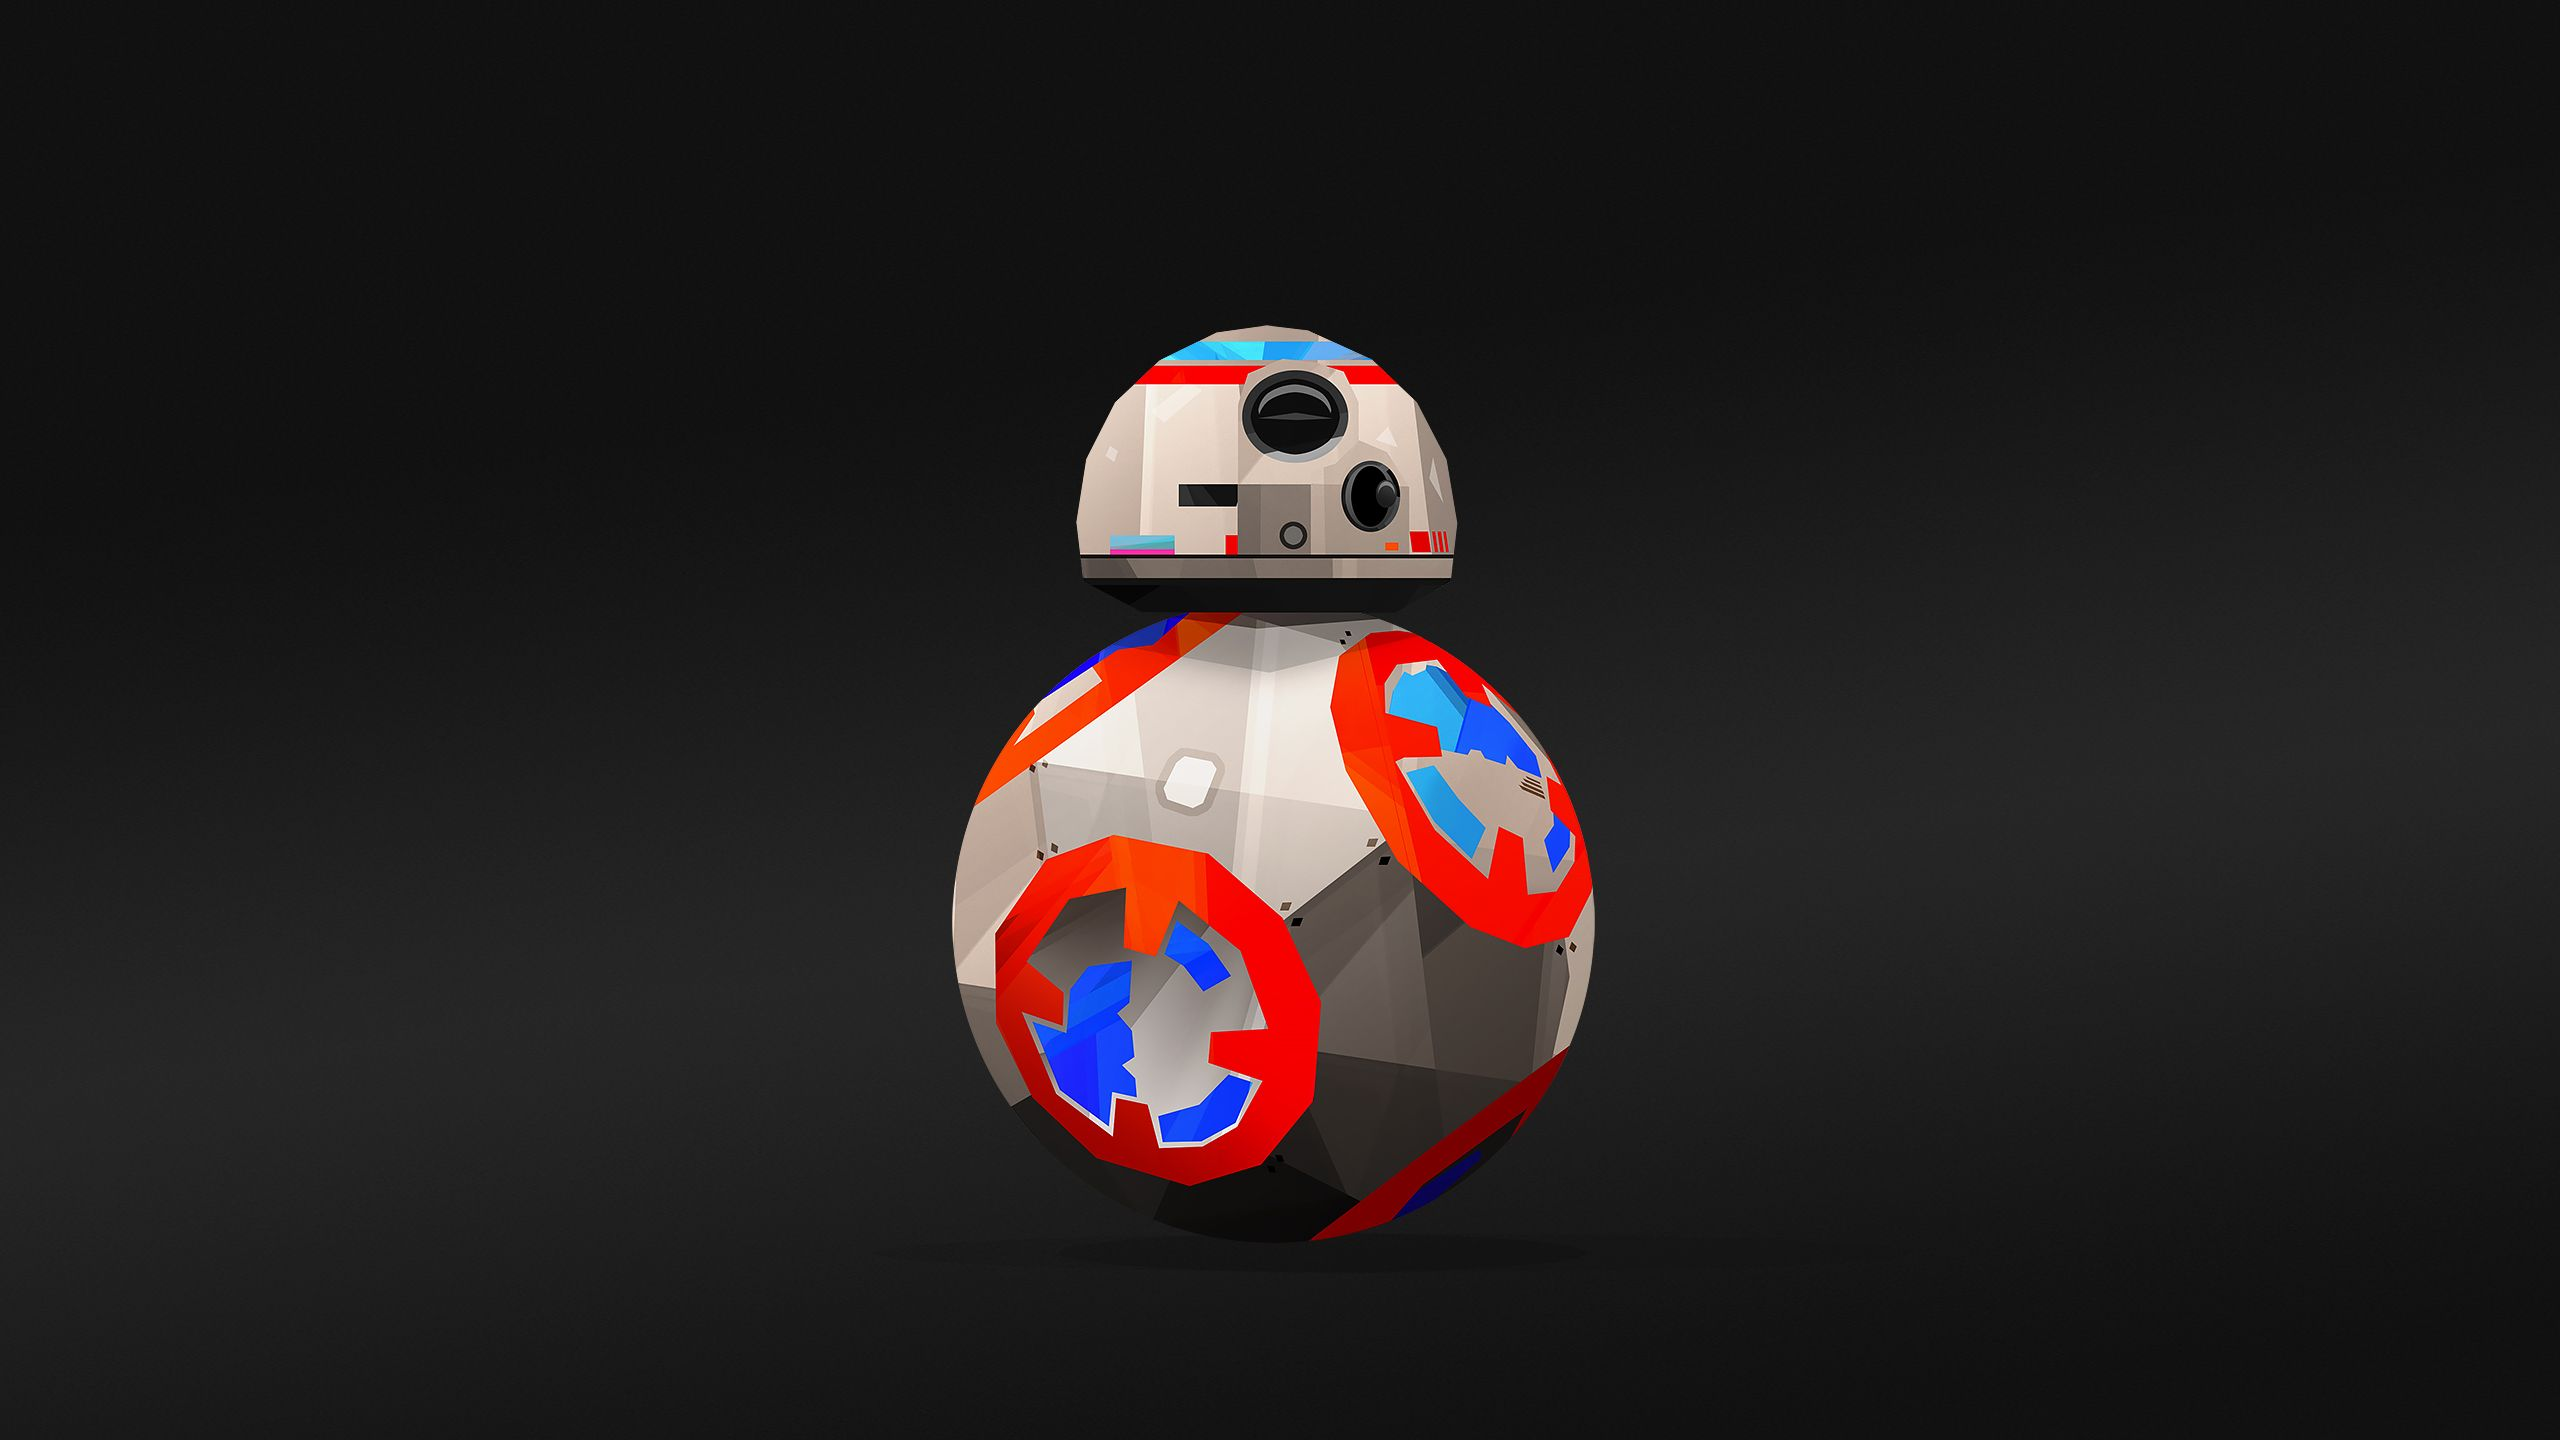 Bb8 Starwars Abstract Robot Art Star wars art Star wars 2560x1440